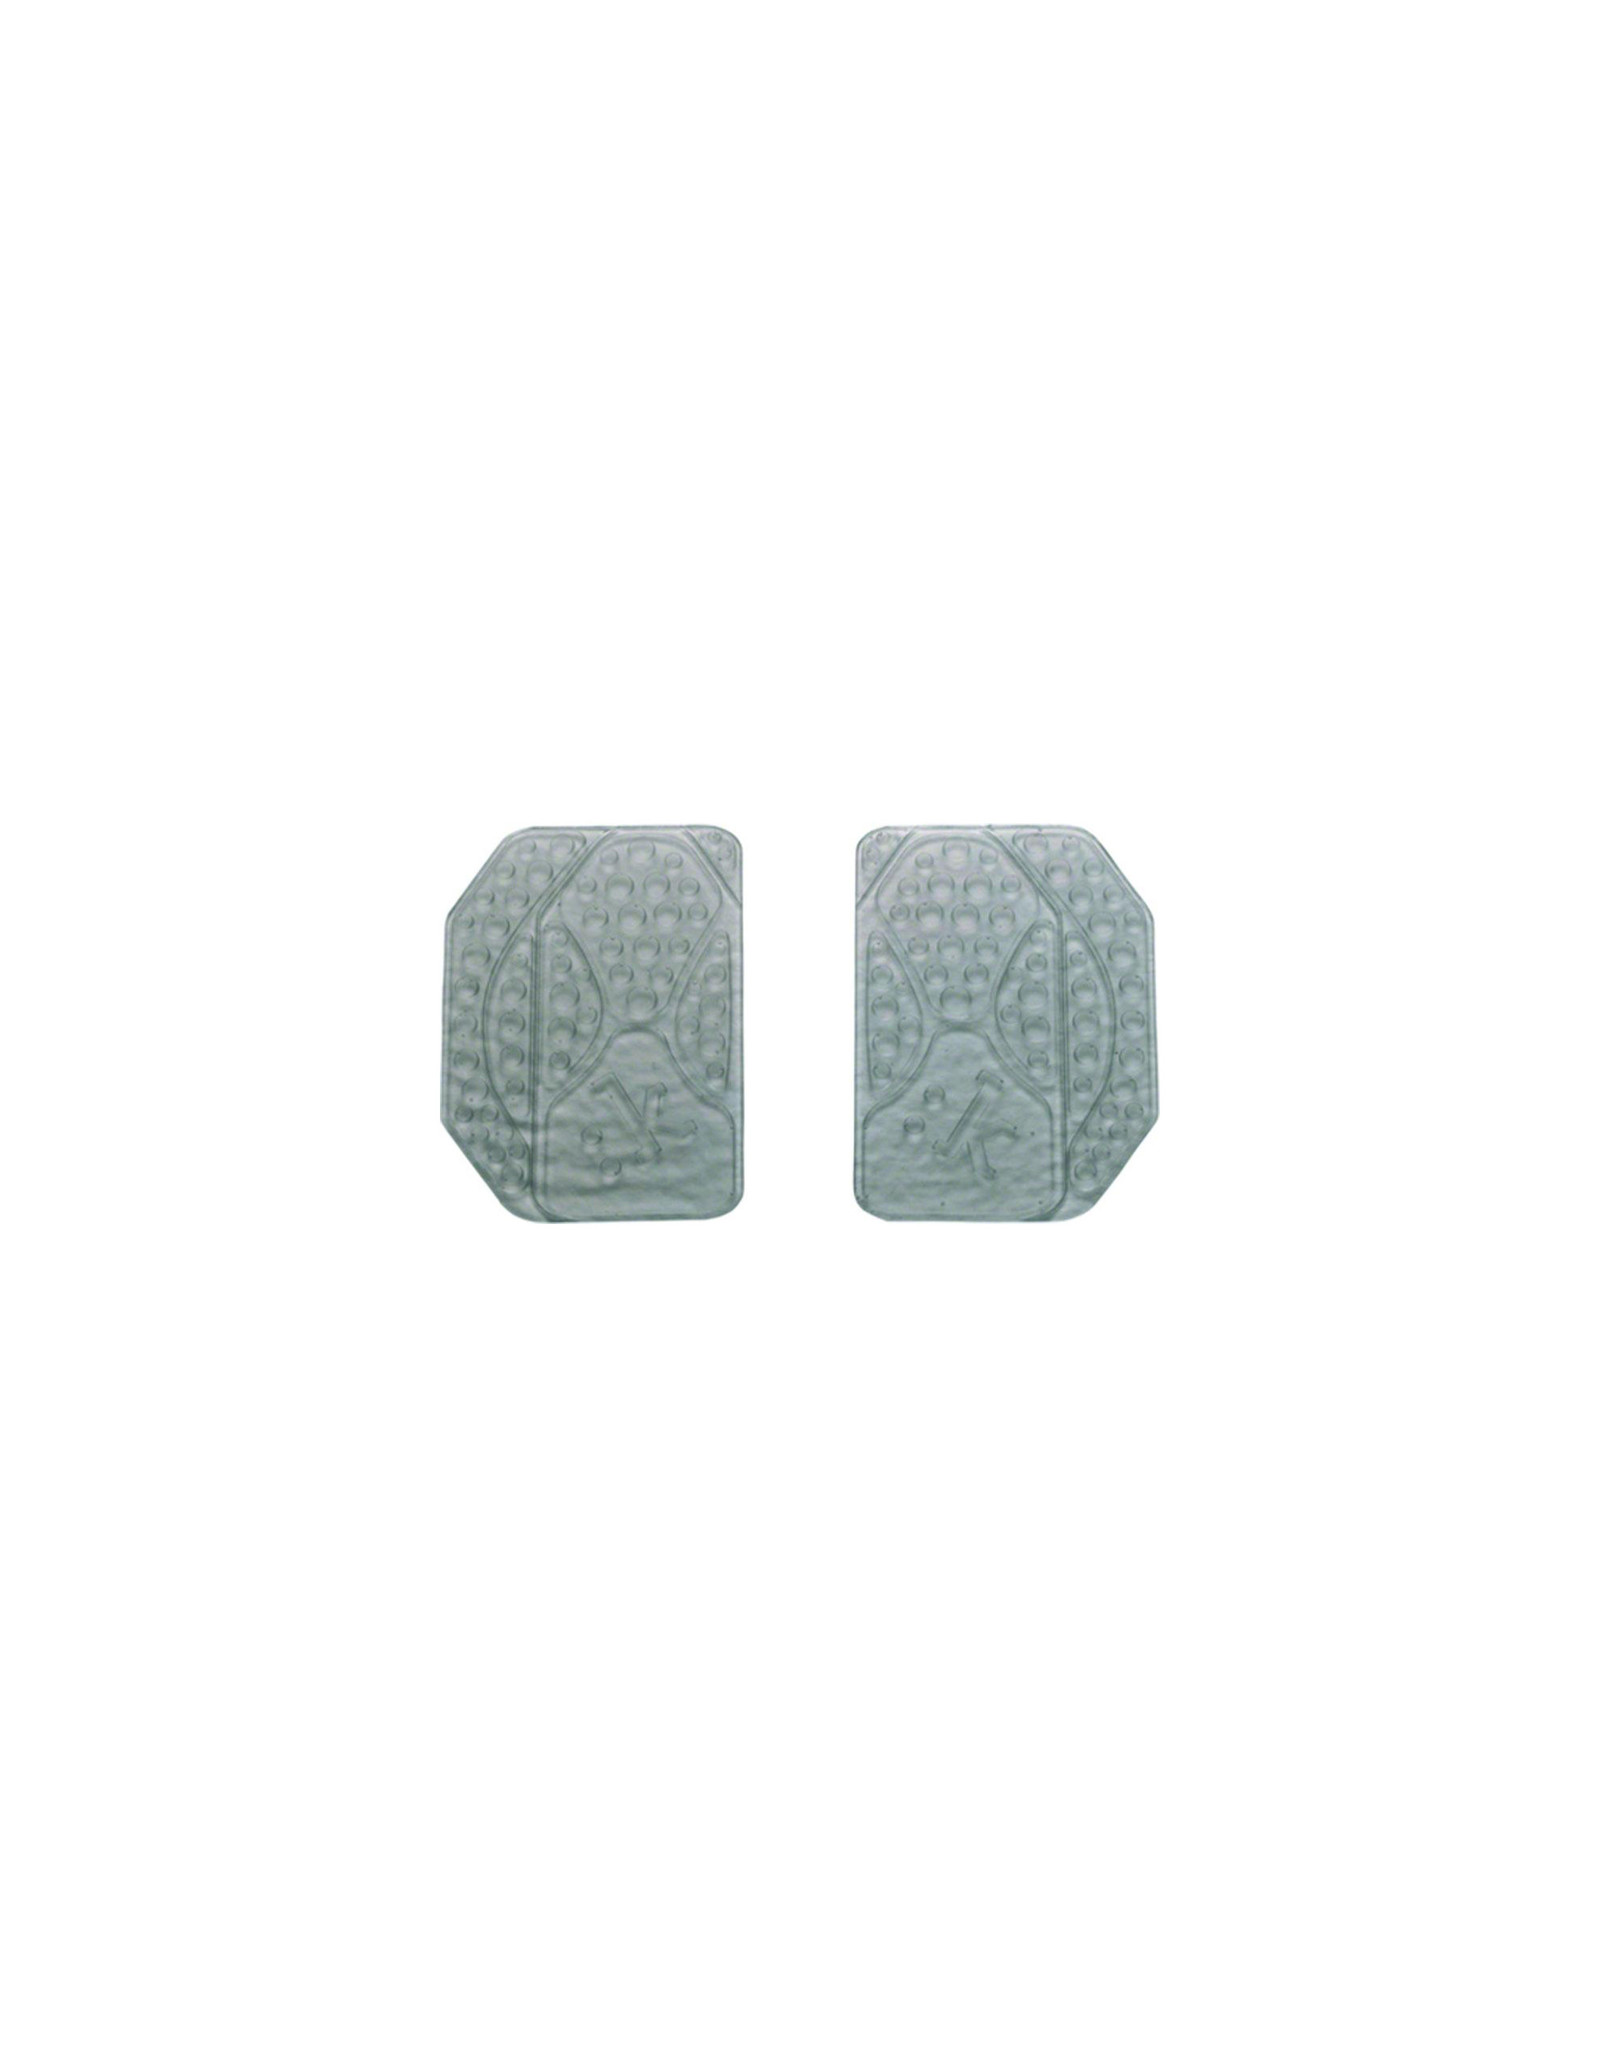 Fizik Fizik, TechNogel, Armrest gel padding (For Vision Armrest)